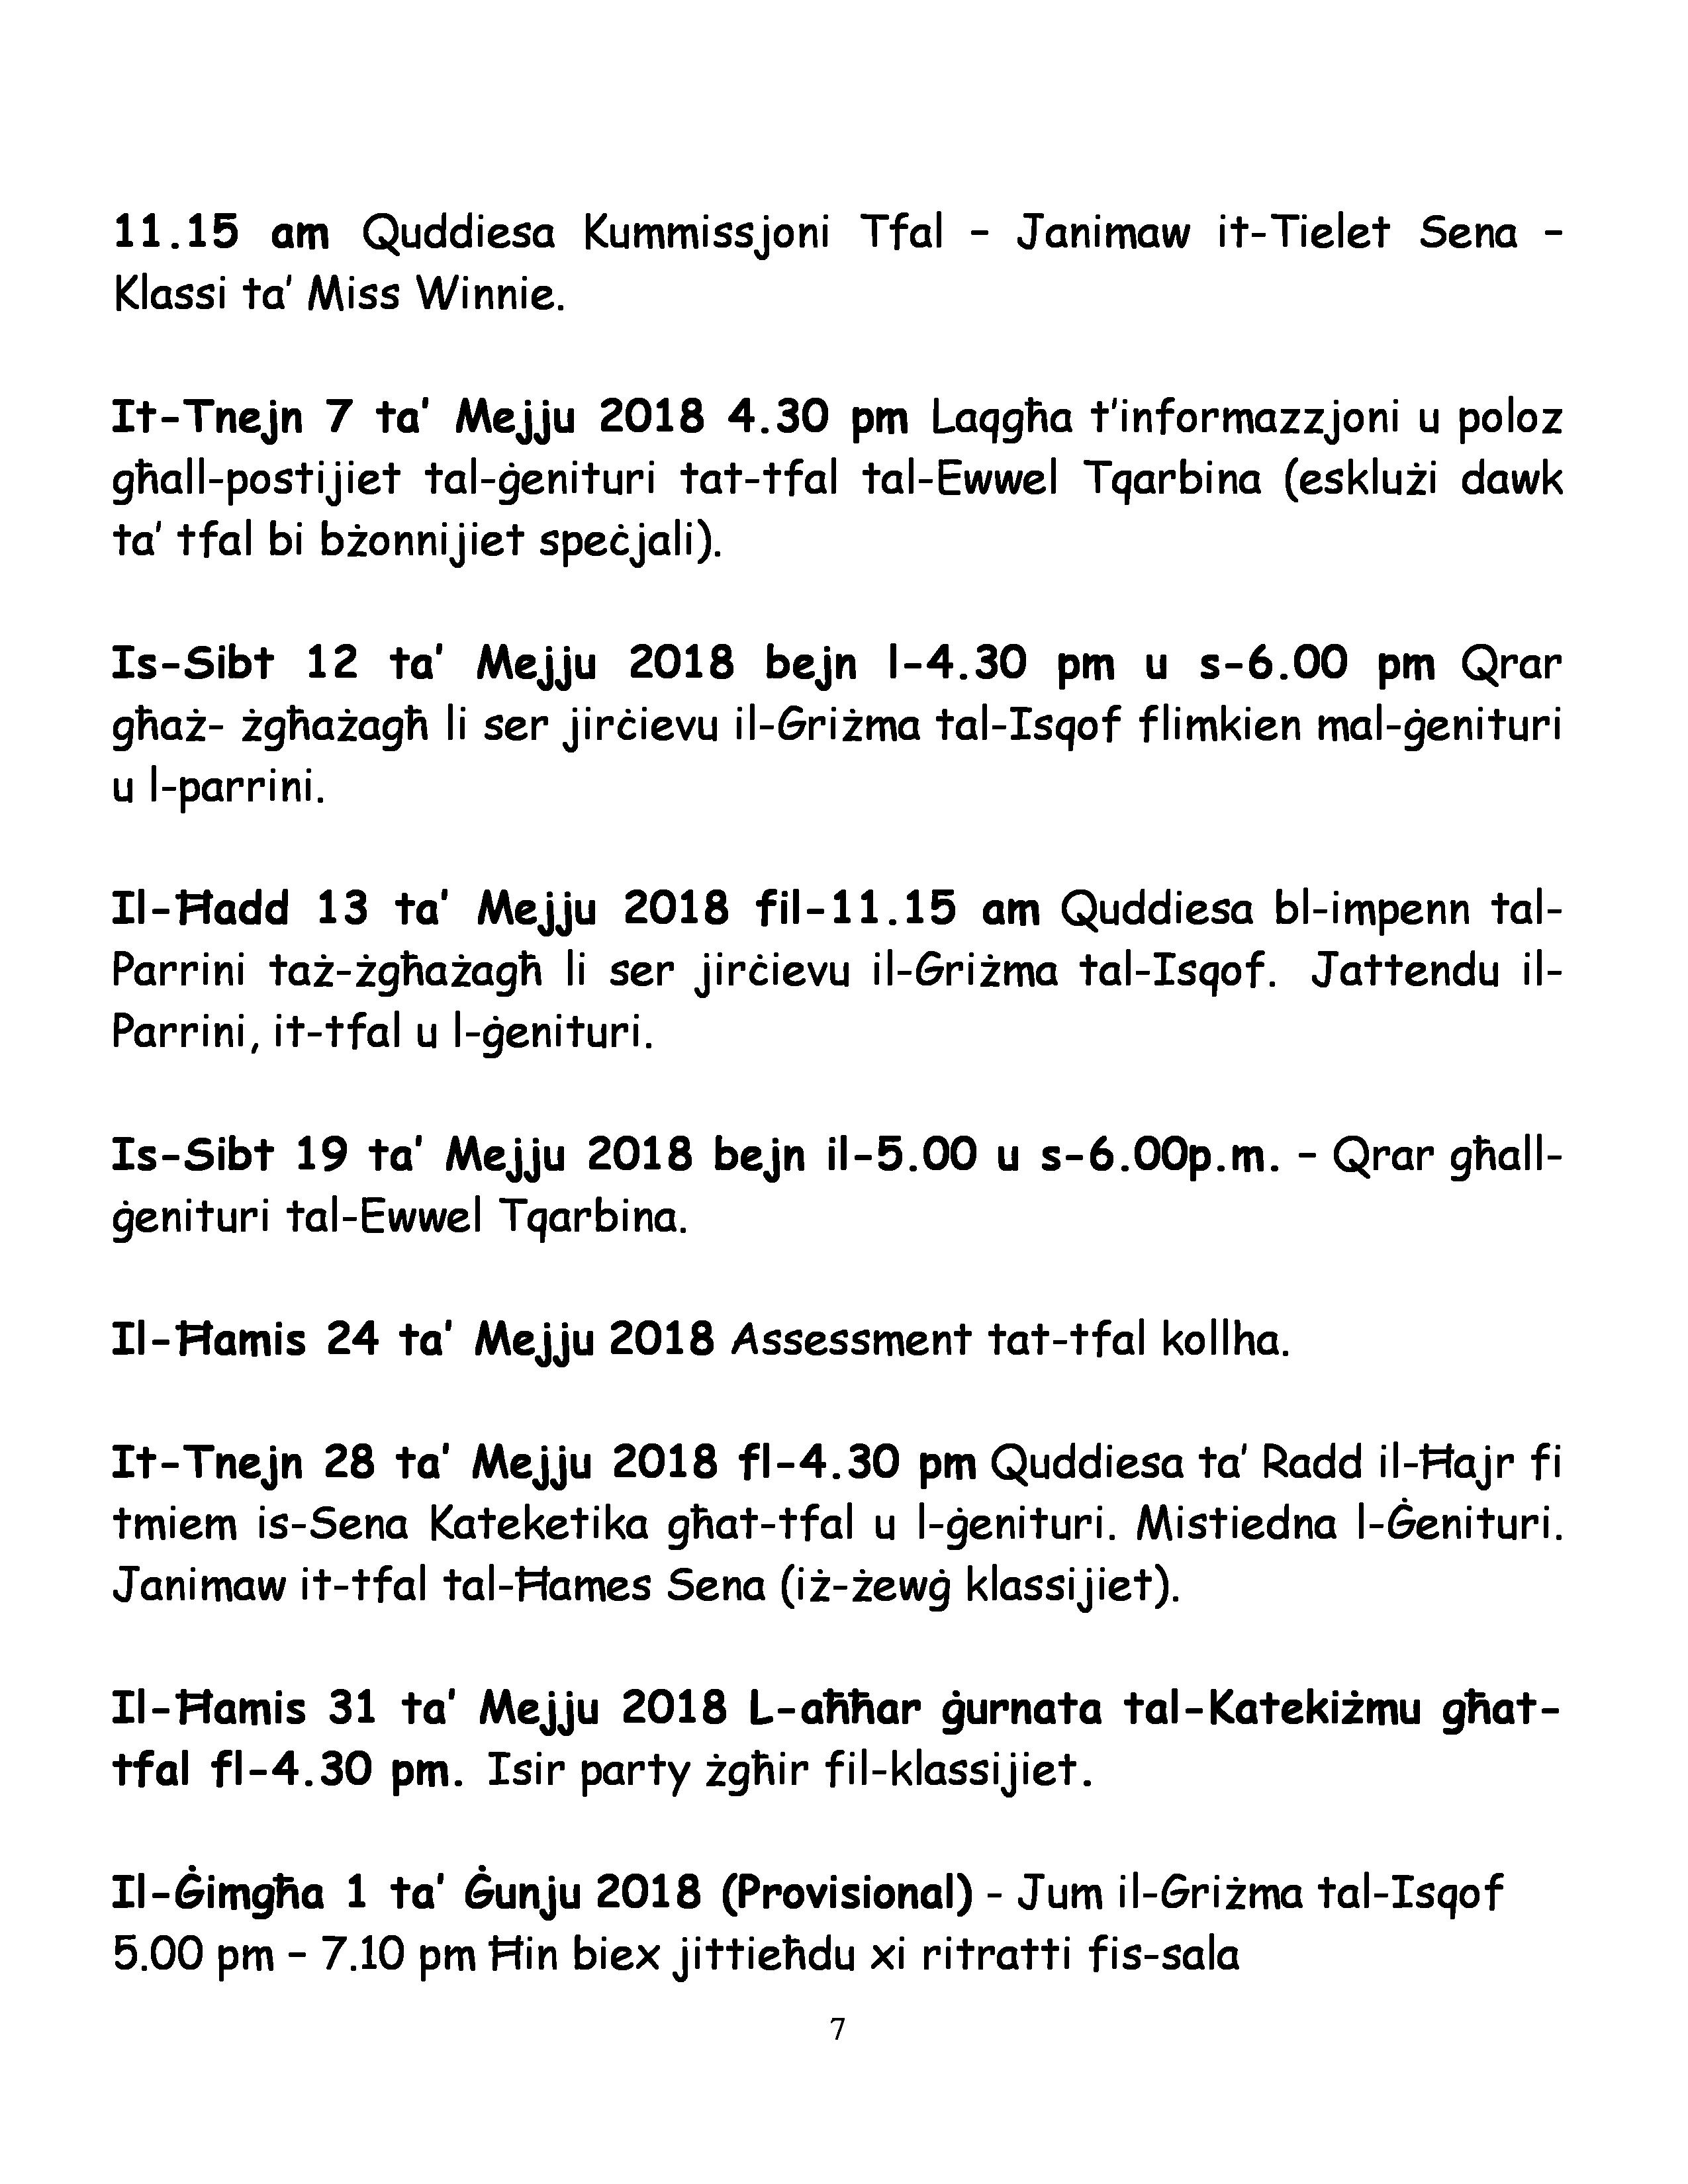 Programm Sena Kateketika 2017-18